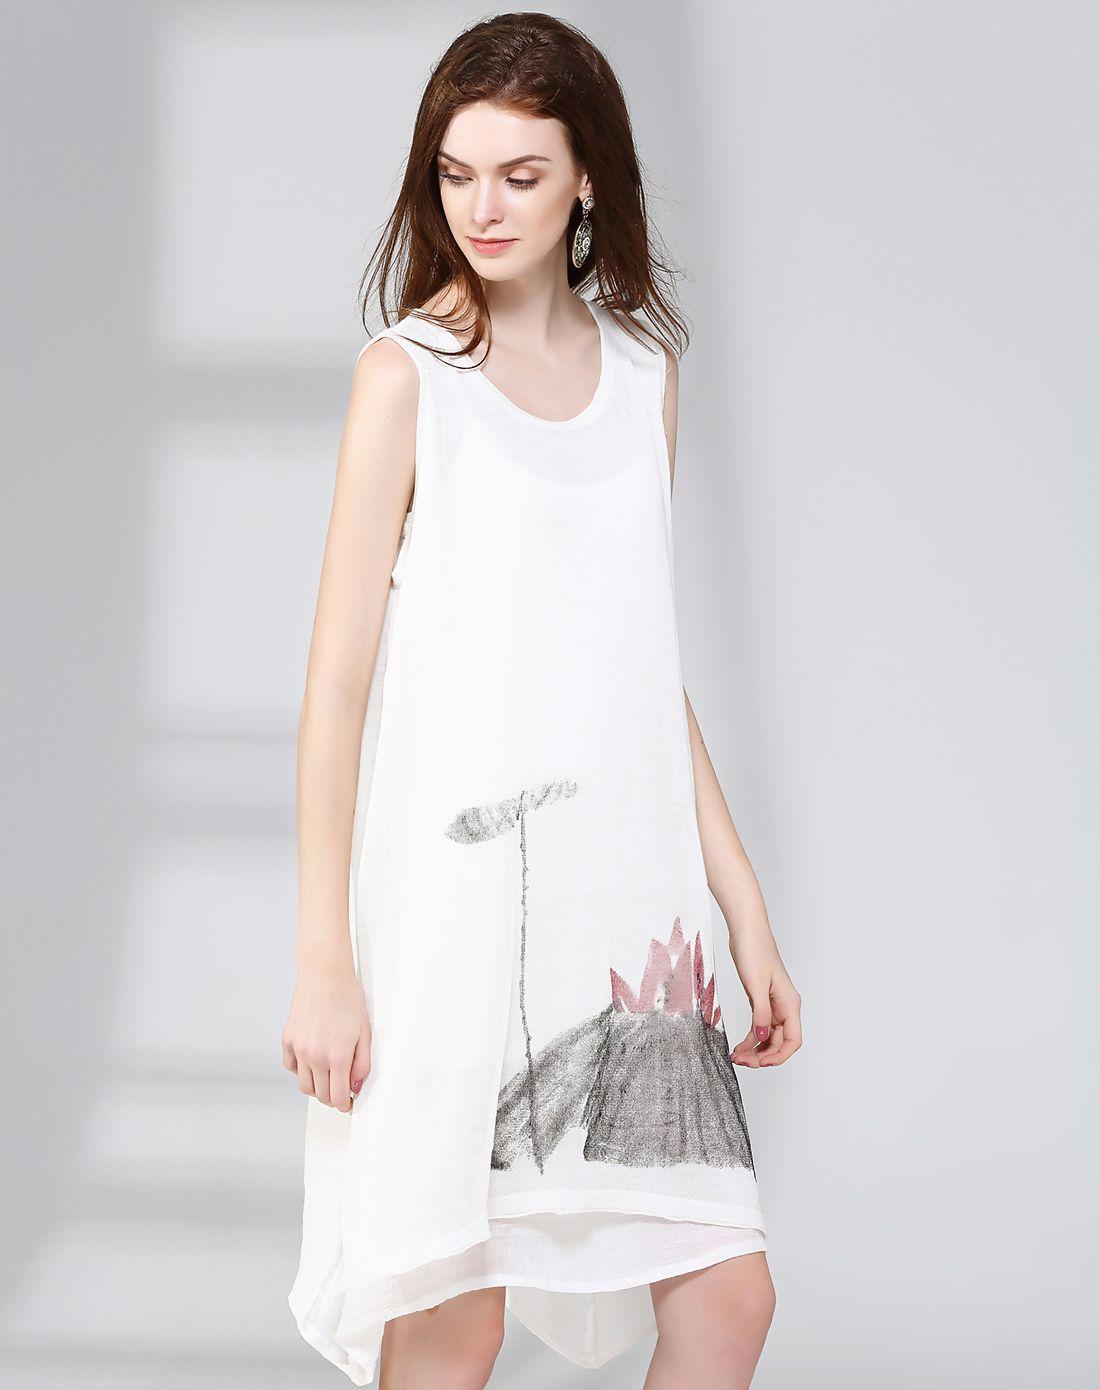 Adorewe vipme swing dressesdesigner natural house white ink and